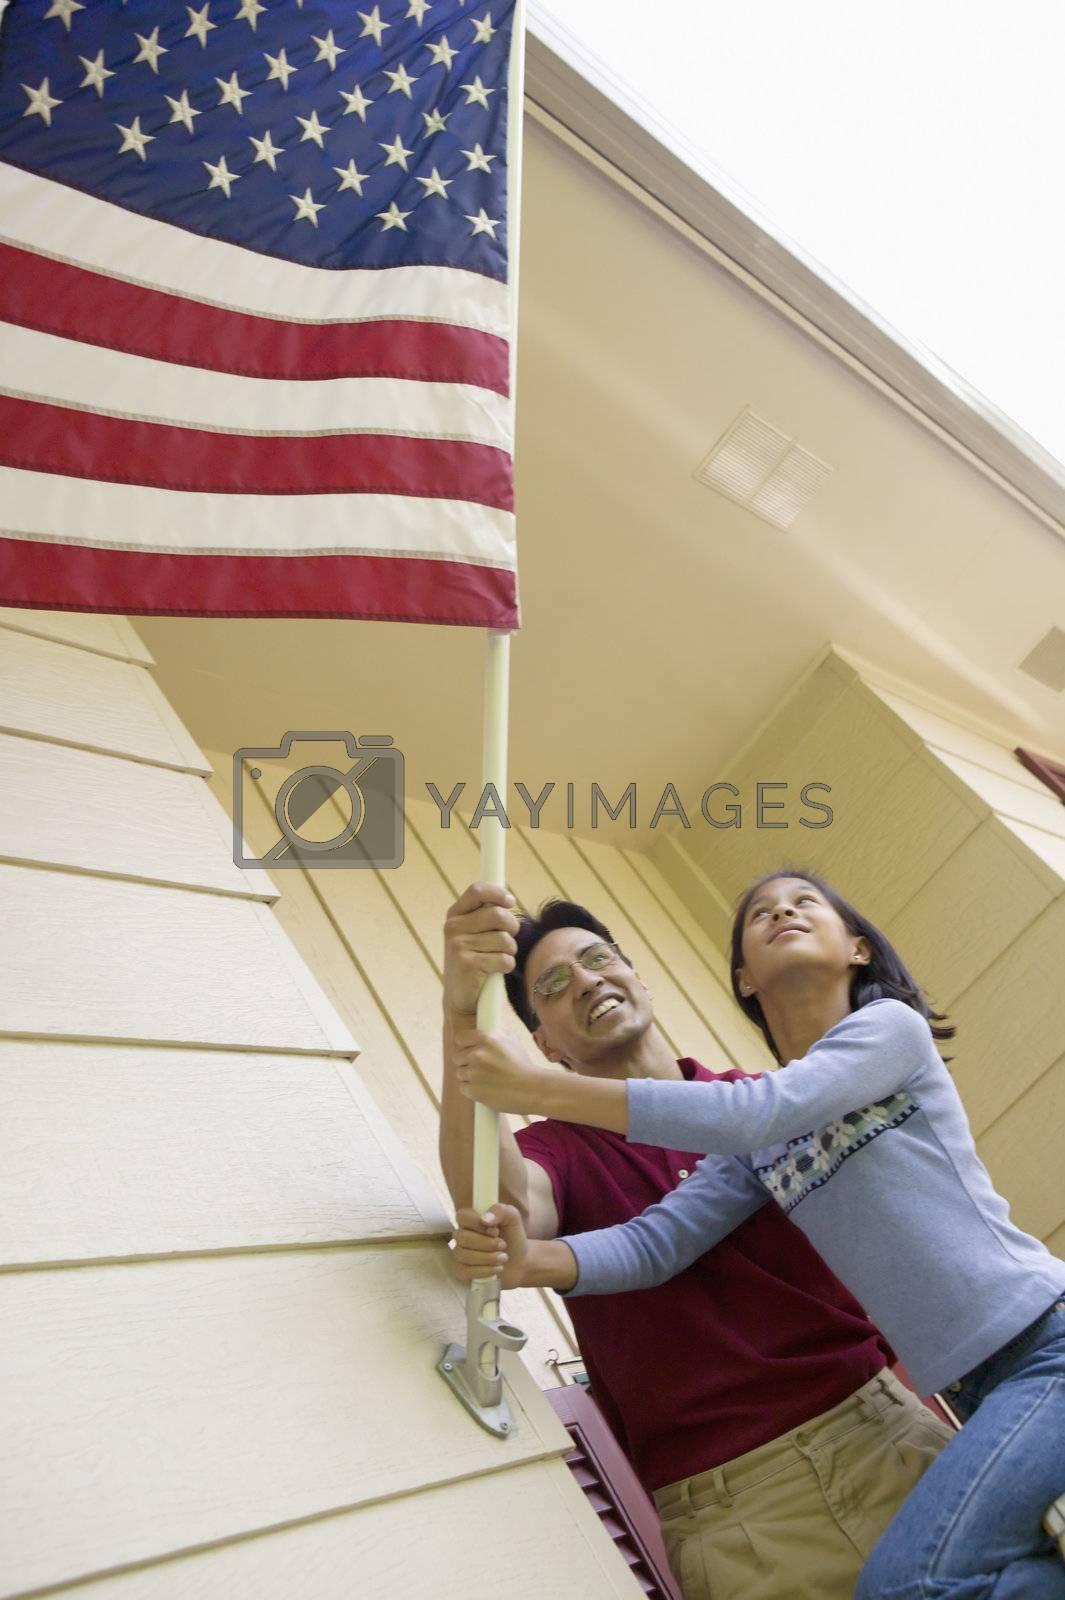 Royalty free image of Raising the flag at home by edbockstock